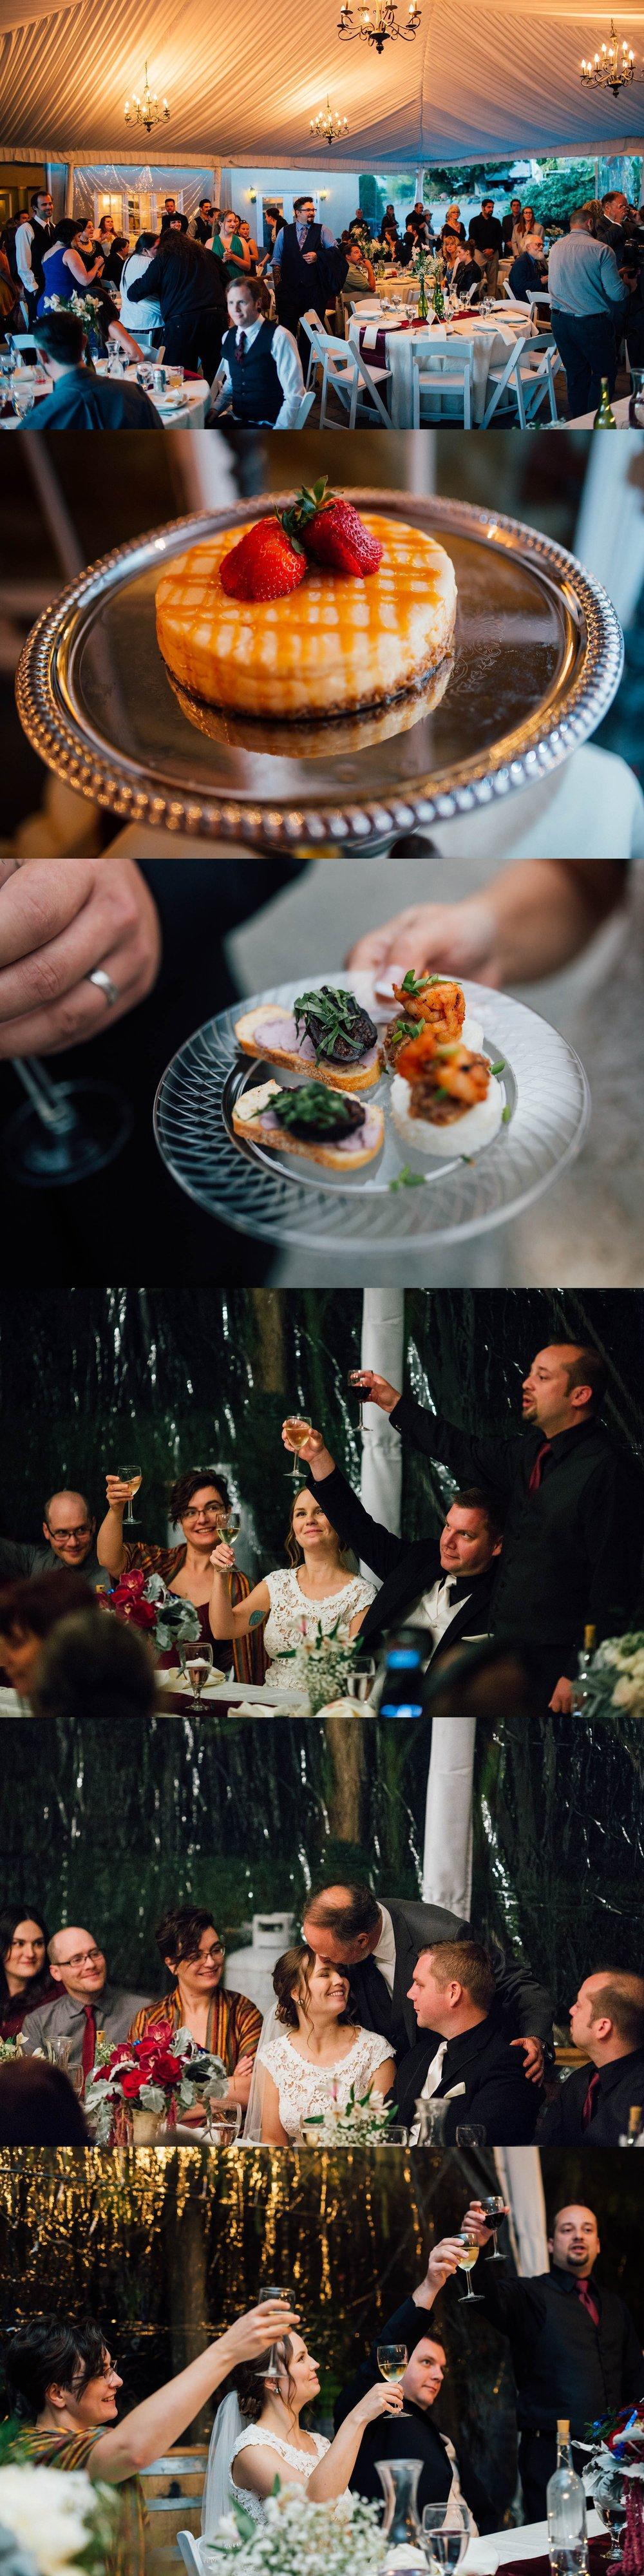 ashley_vos_seattle_ wedding_photographer_0199.jpg